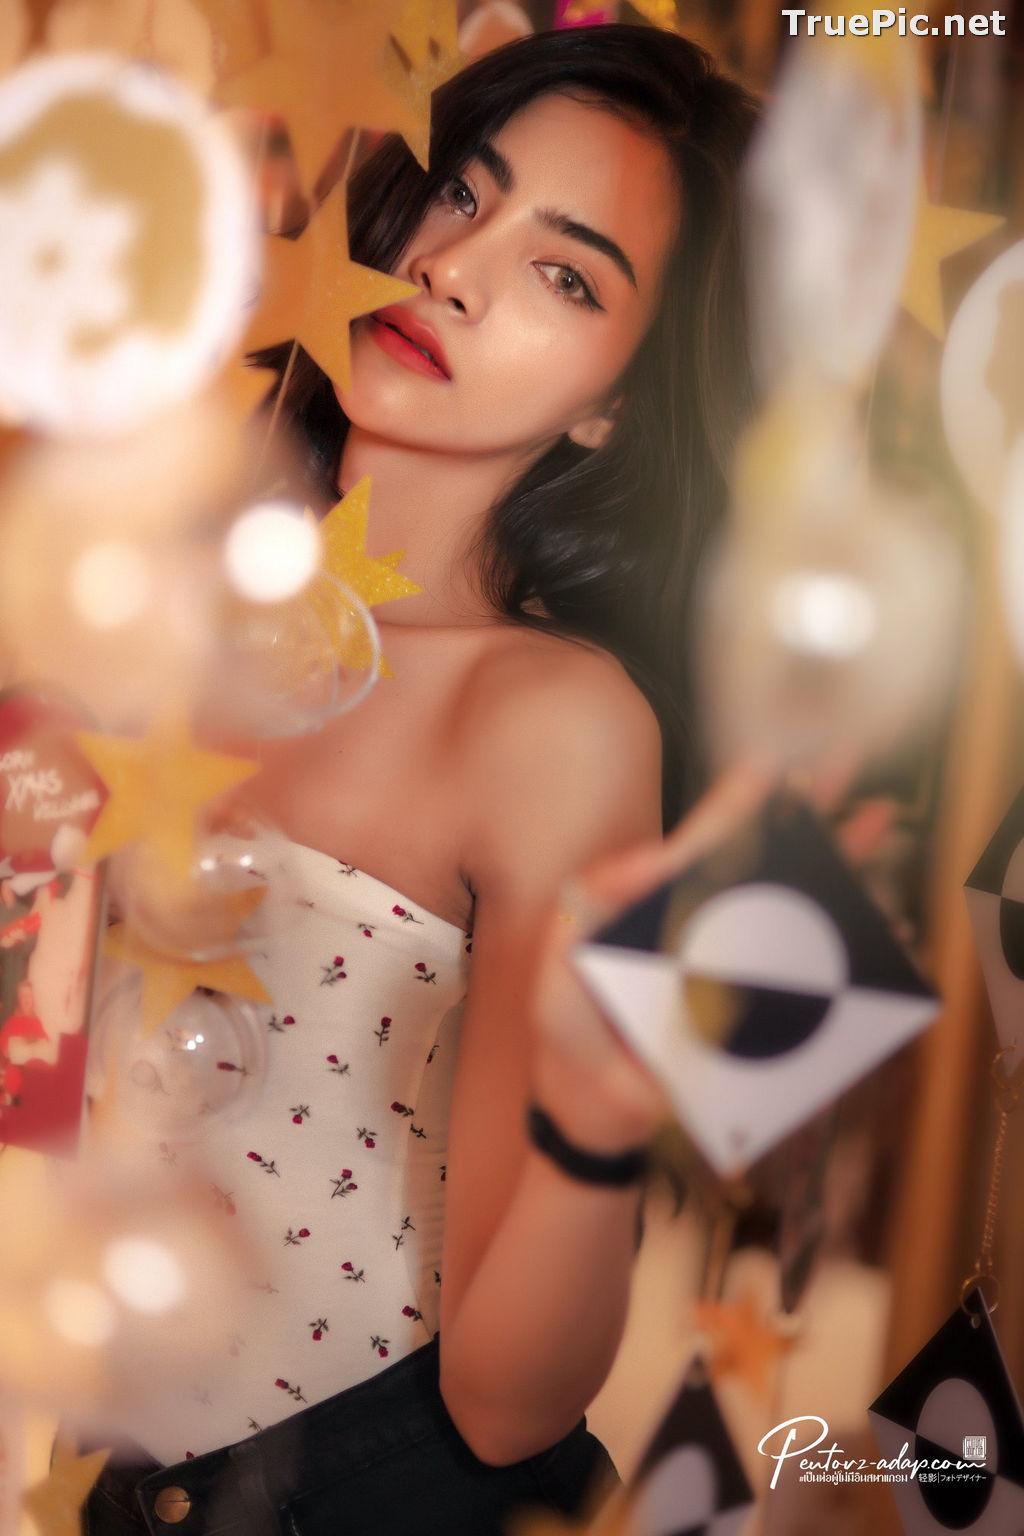 Image Thailand Model - Nenne Kanatsanan - Light A Burn - TruePic.net - Picture-4